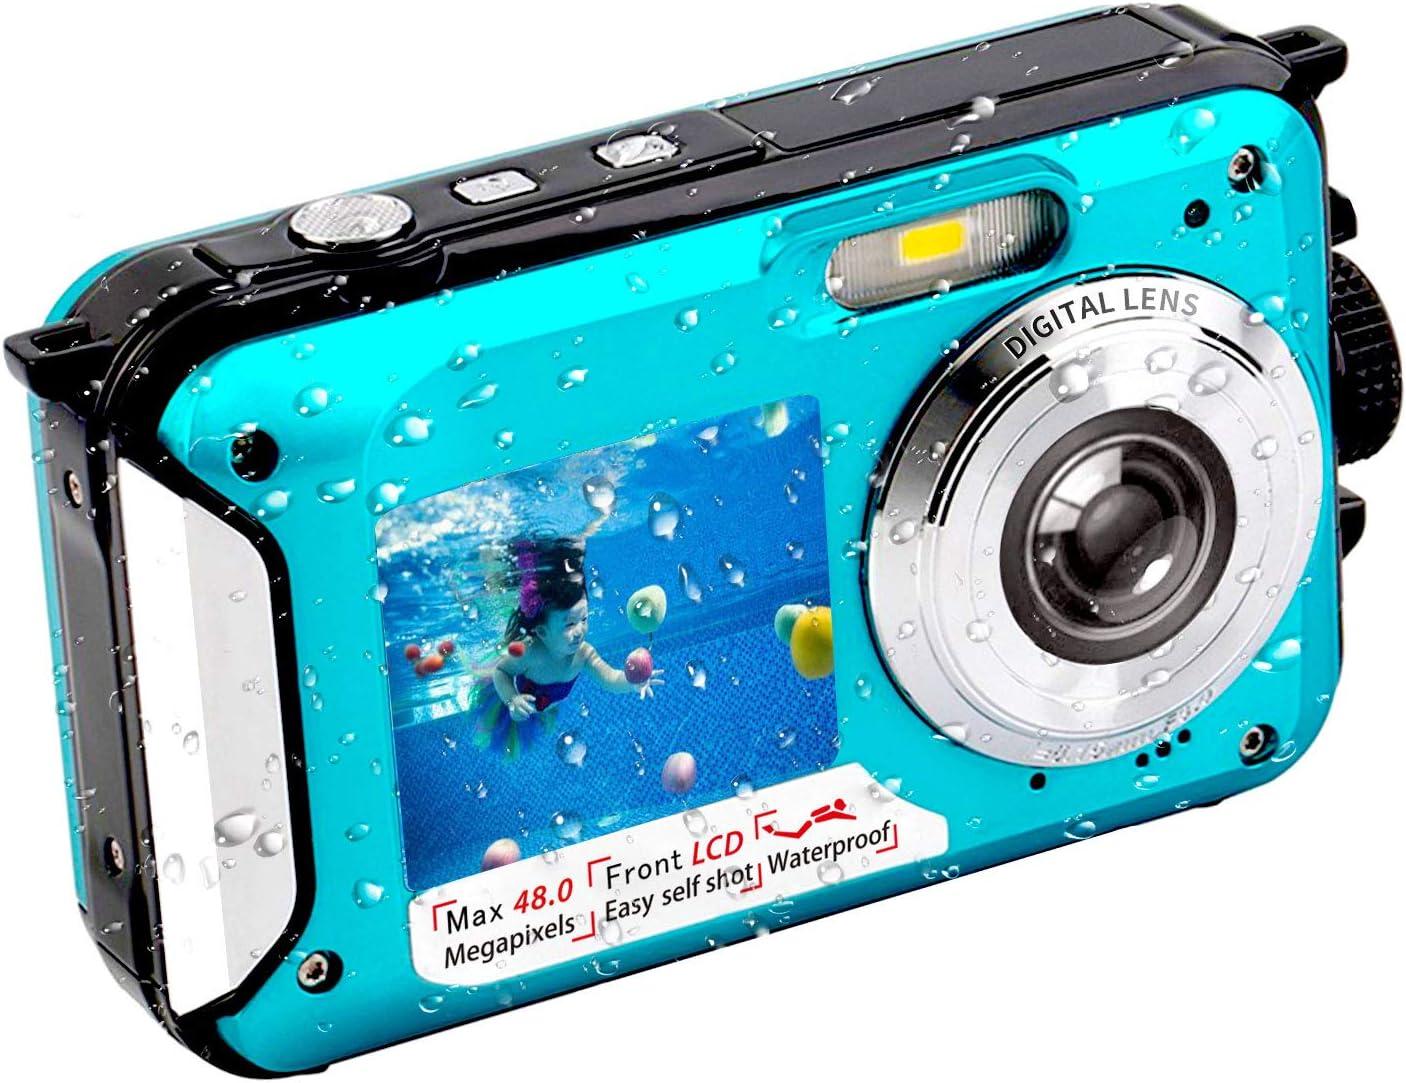 Underwater Camera FHD 2.7K 48 MP Waterproof Digital Camera Selfie Dual Screen Full-Color LCD Displays Waterproof Digital Camera for Snorkeling (806BC) : Electronics